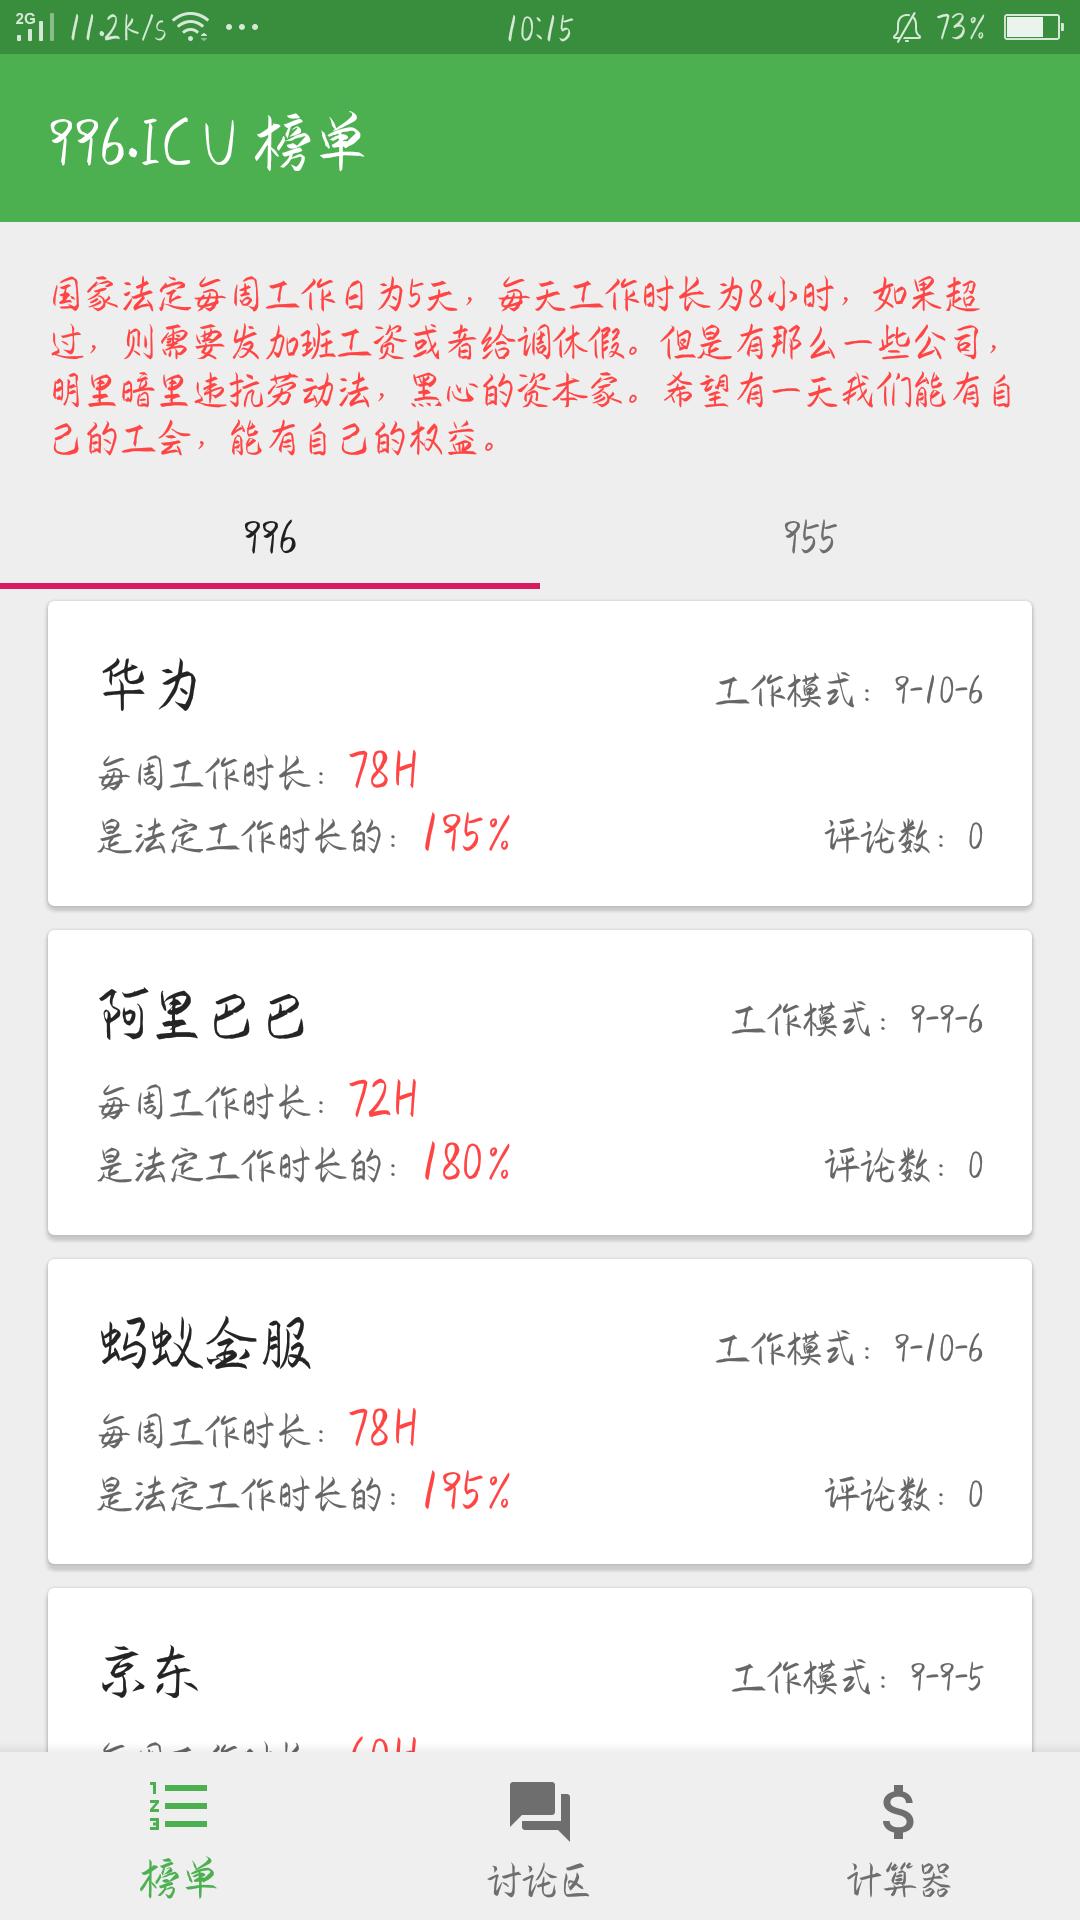 996ICU app v1.3安卓版下载